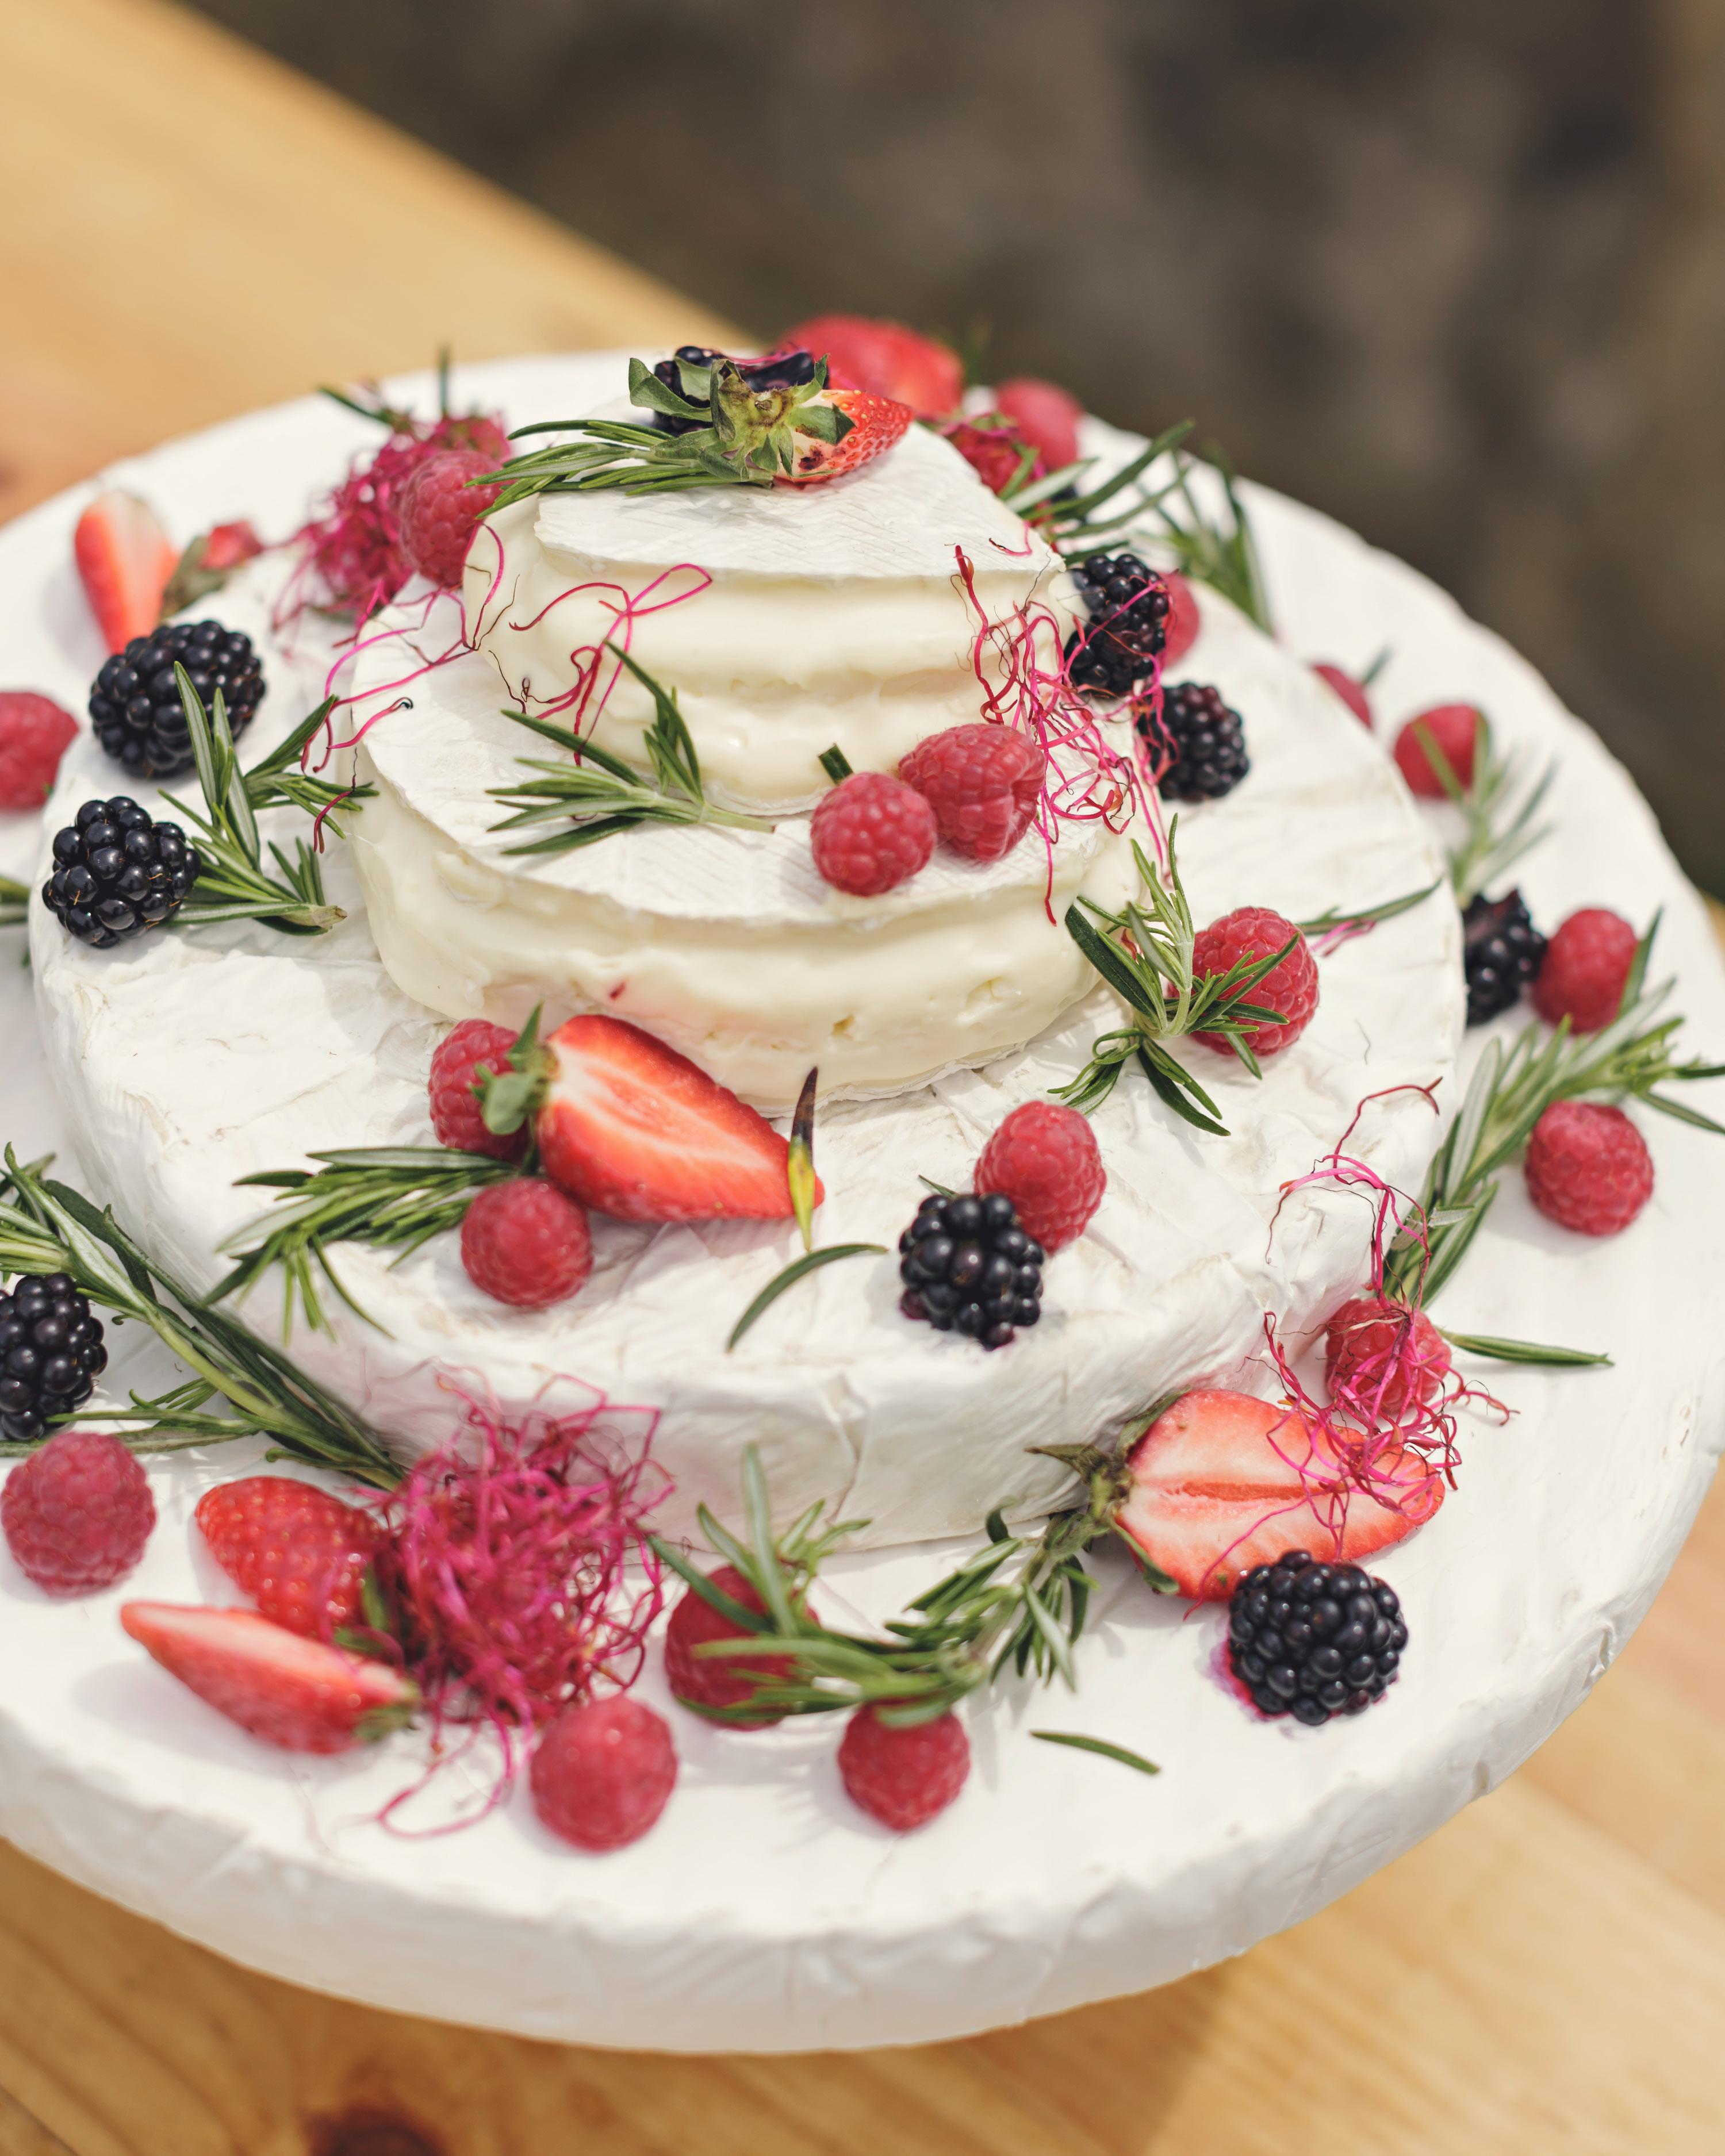 anna-ania-wedding-cake-0432-s112510-0216.jpg